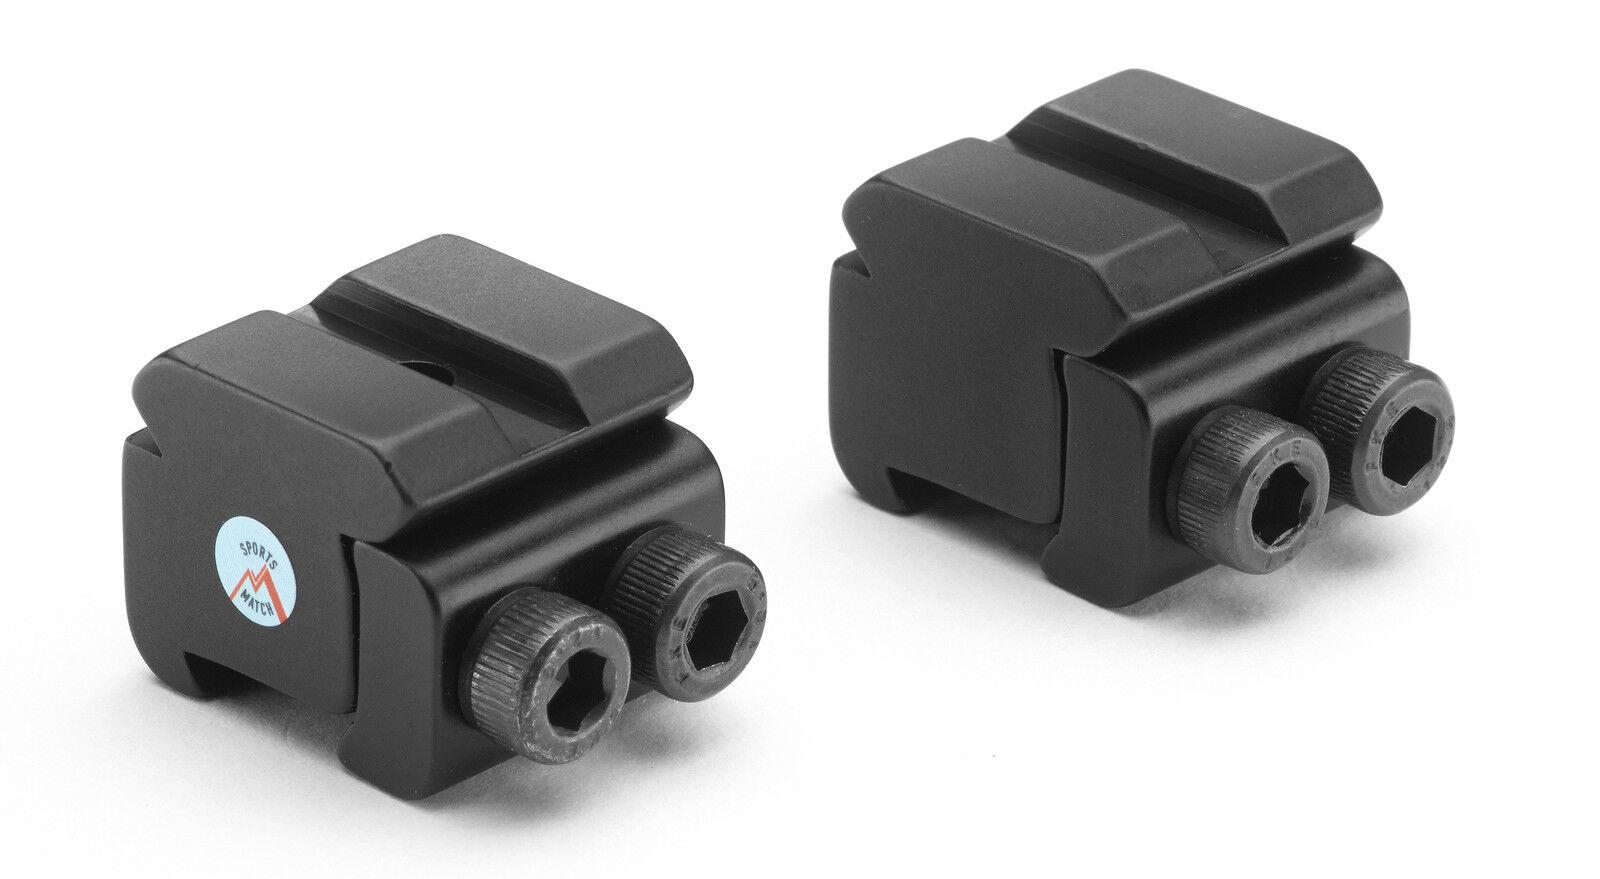 SPORTSMATCH RB5 9.5mm - Weaver   Picatinny Scope Rail Adapt.for Night Sights etc